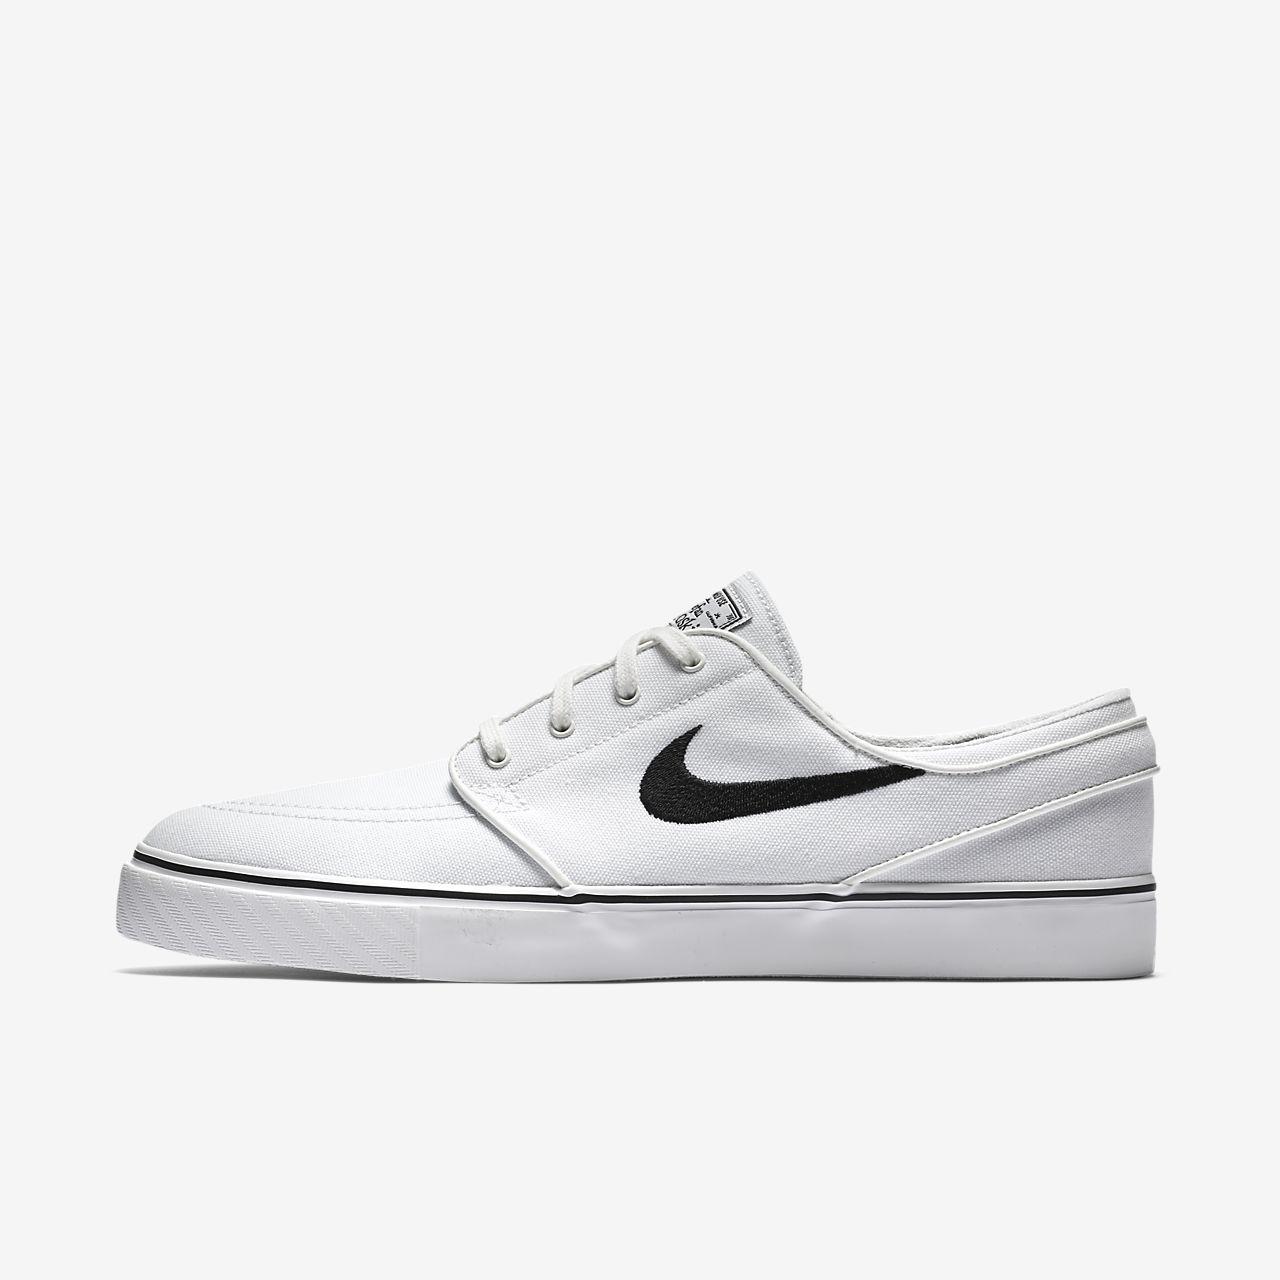 Herren/Damen Nike Sb Zoom Stefan Janoski L Schuhe Niedrig aq2aEWmb